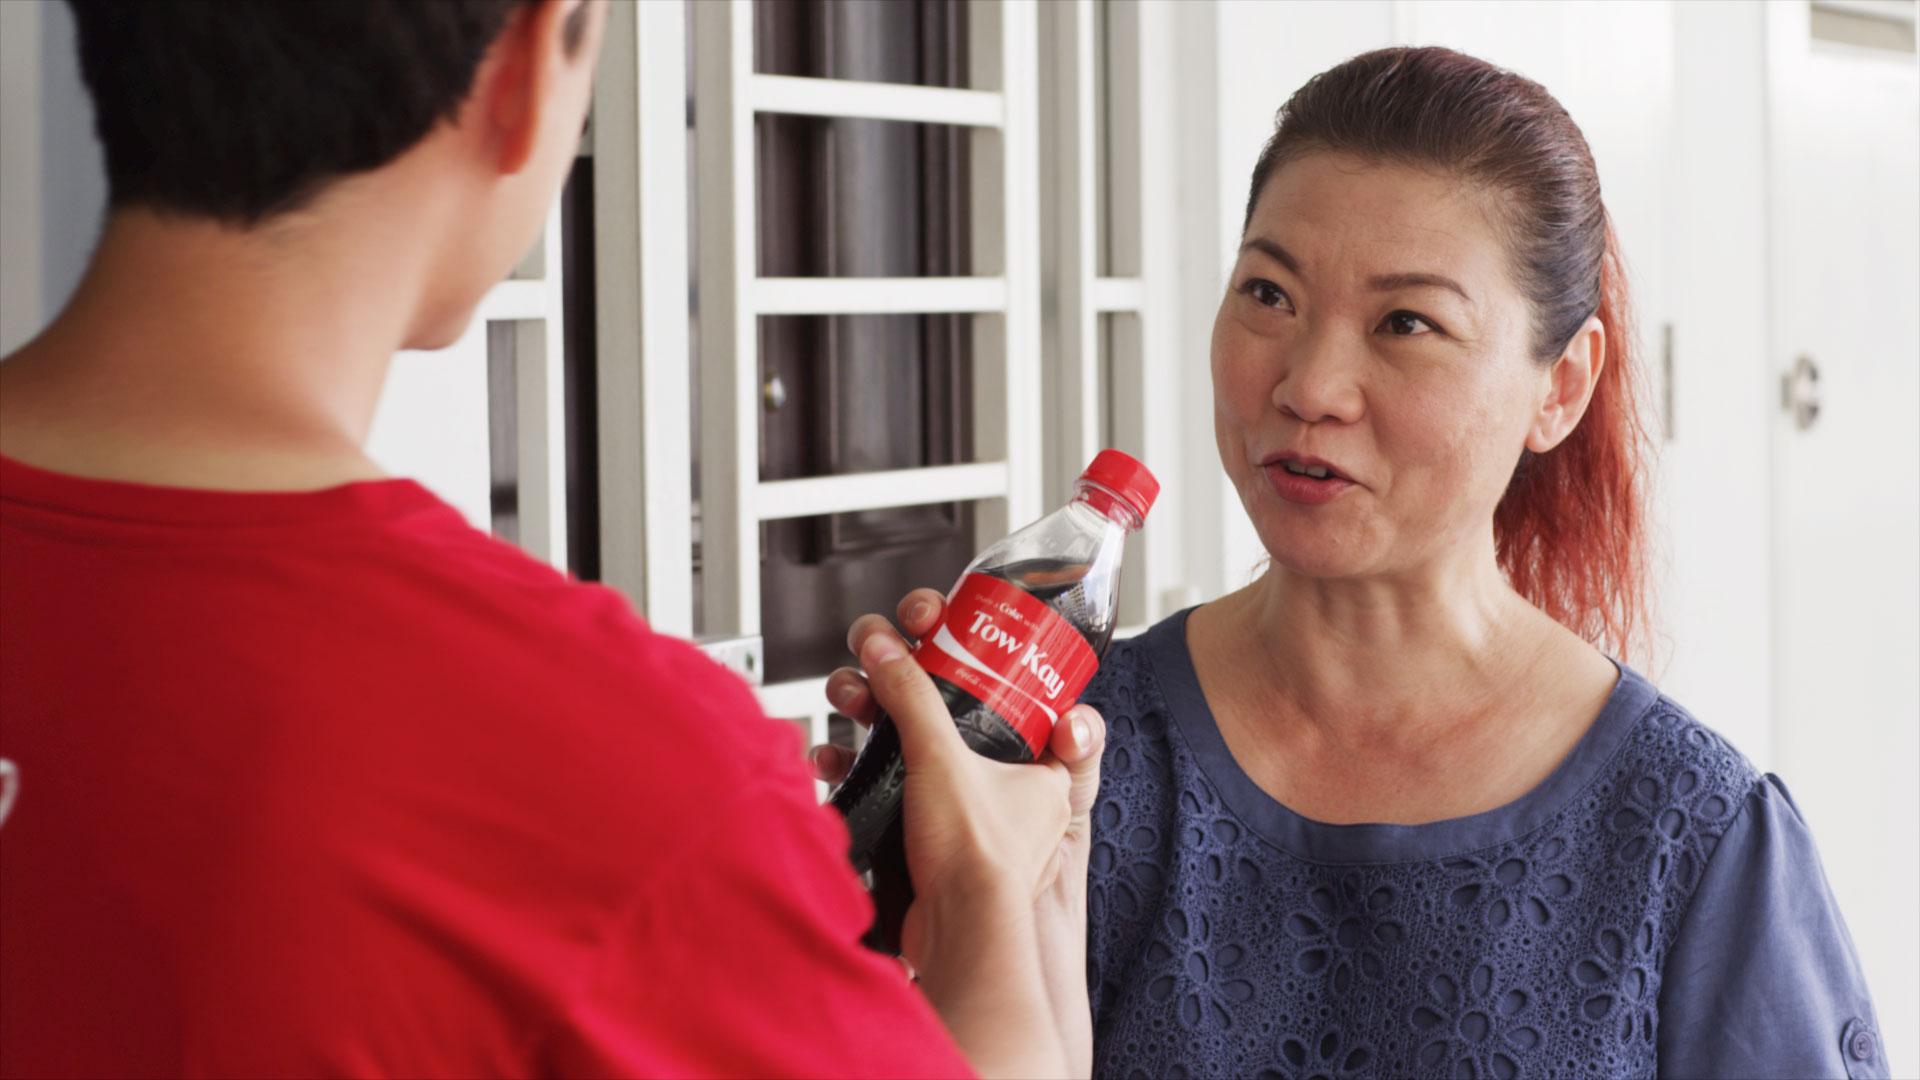 Digital signage content Share a Coke Singapore